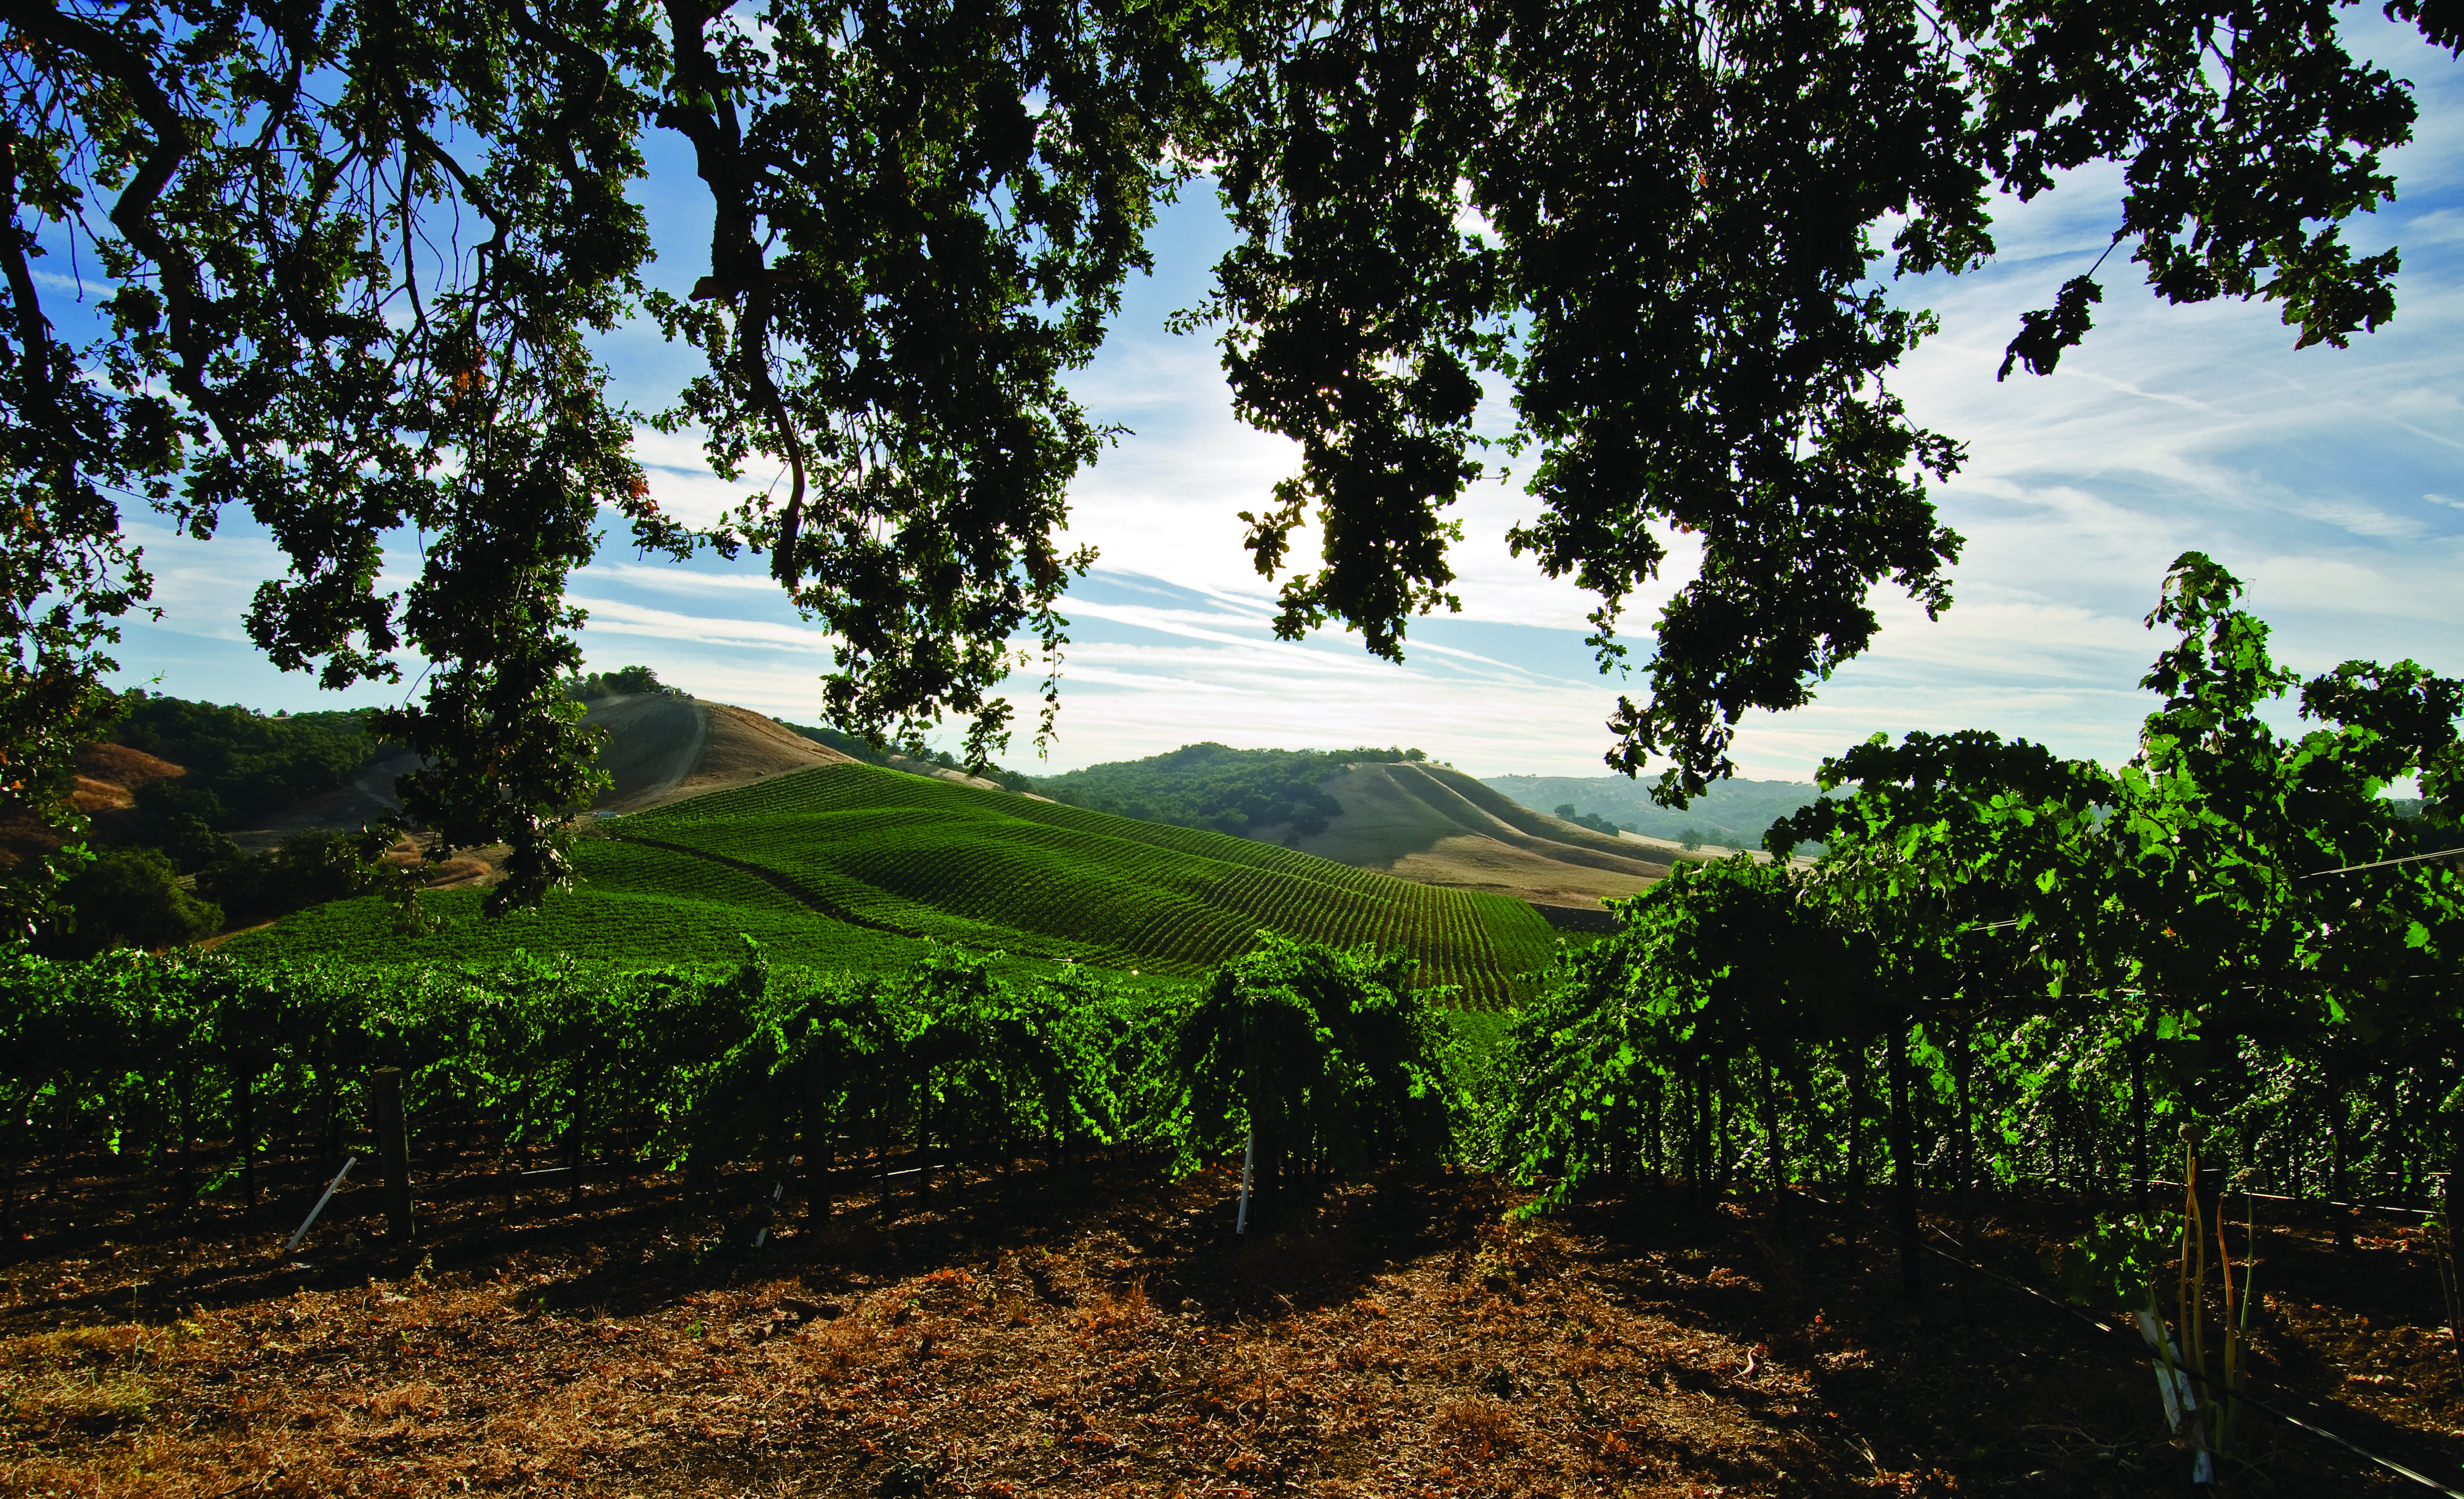 Vineyard with overhang.